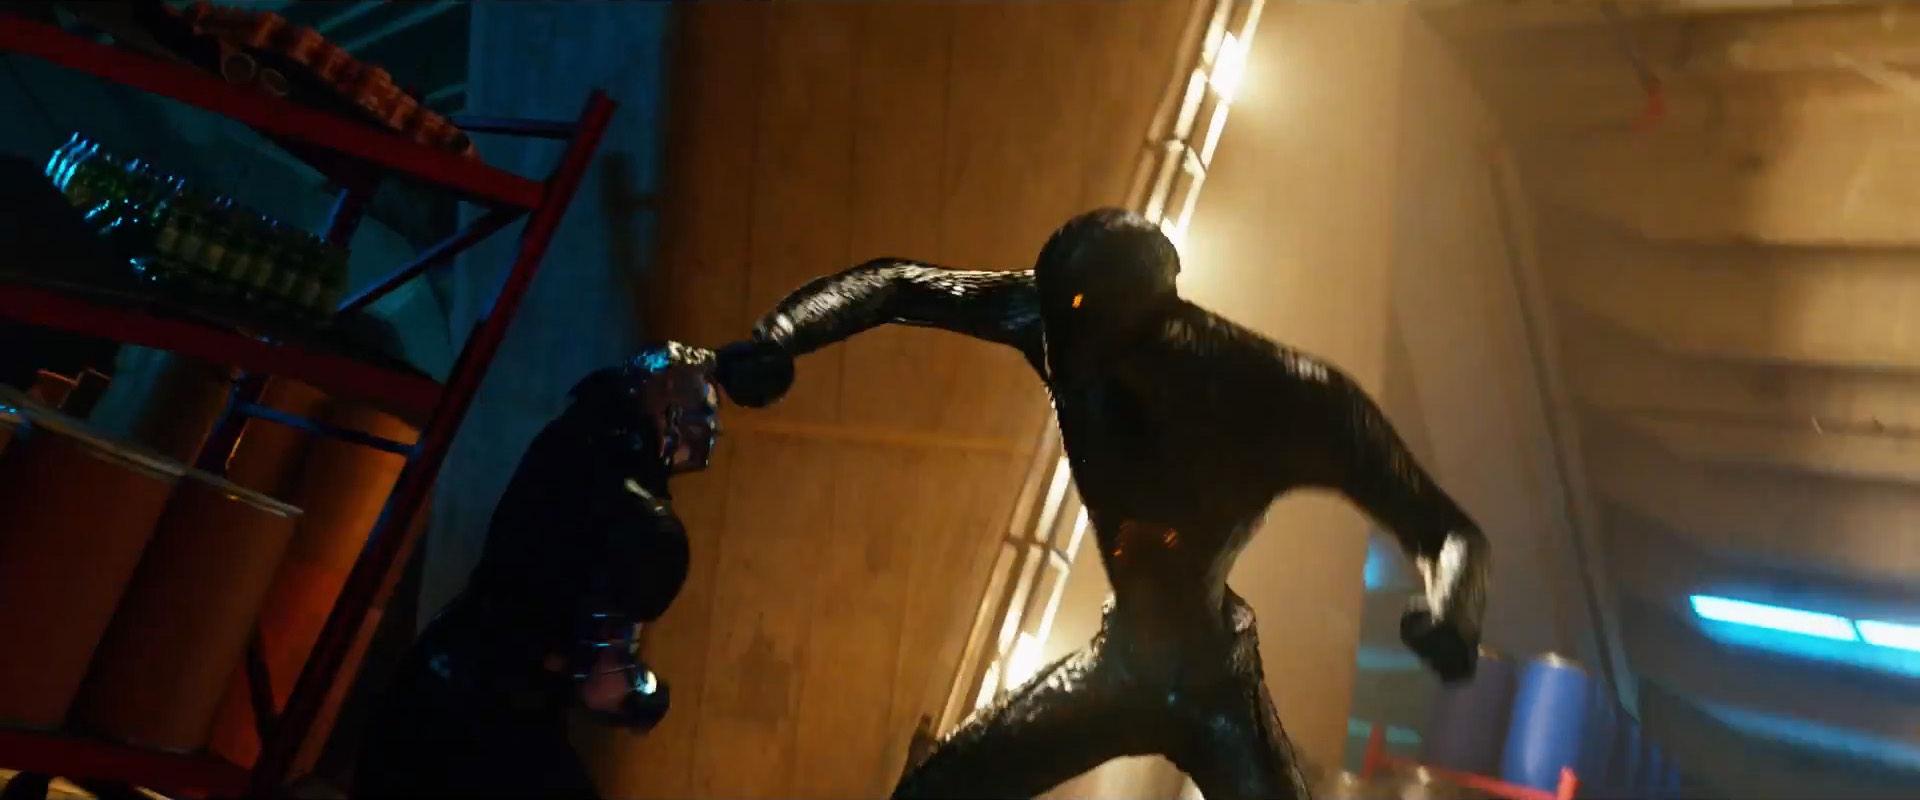 Image - X-Men-Days-of-Future-Past-Sentinel-vs-Colossus.jpg   X-Men ... X Men Days Of Future Past Sentinels